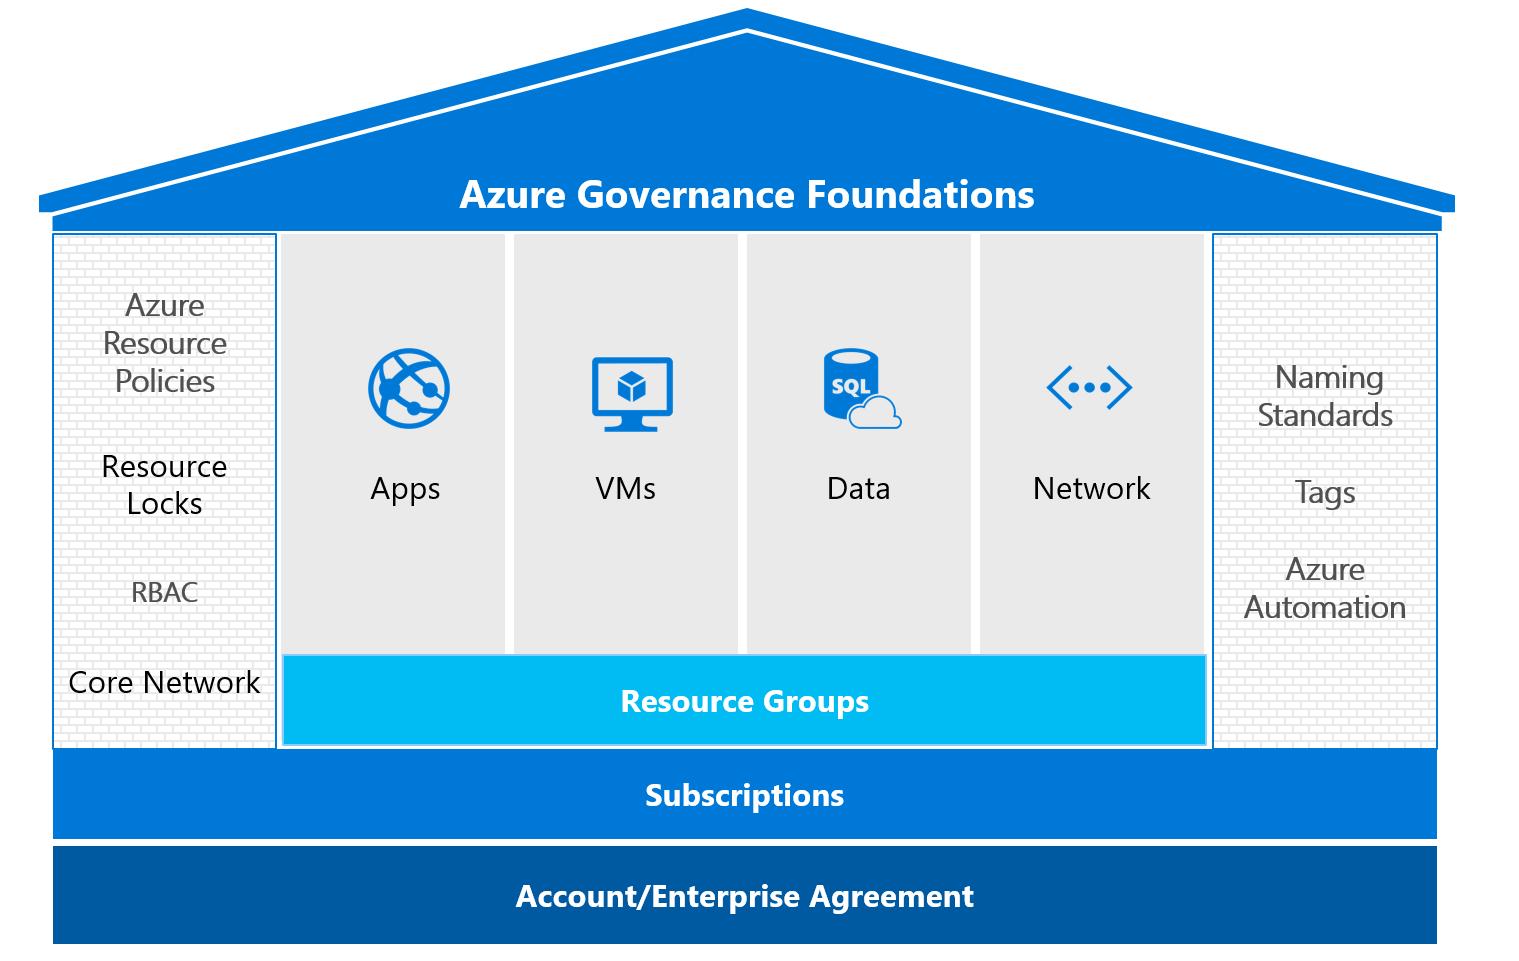 Azure Goverance Foundations